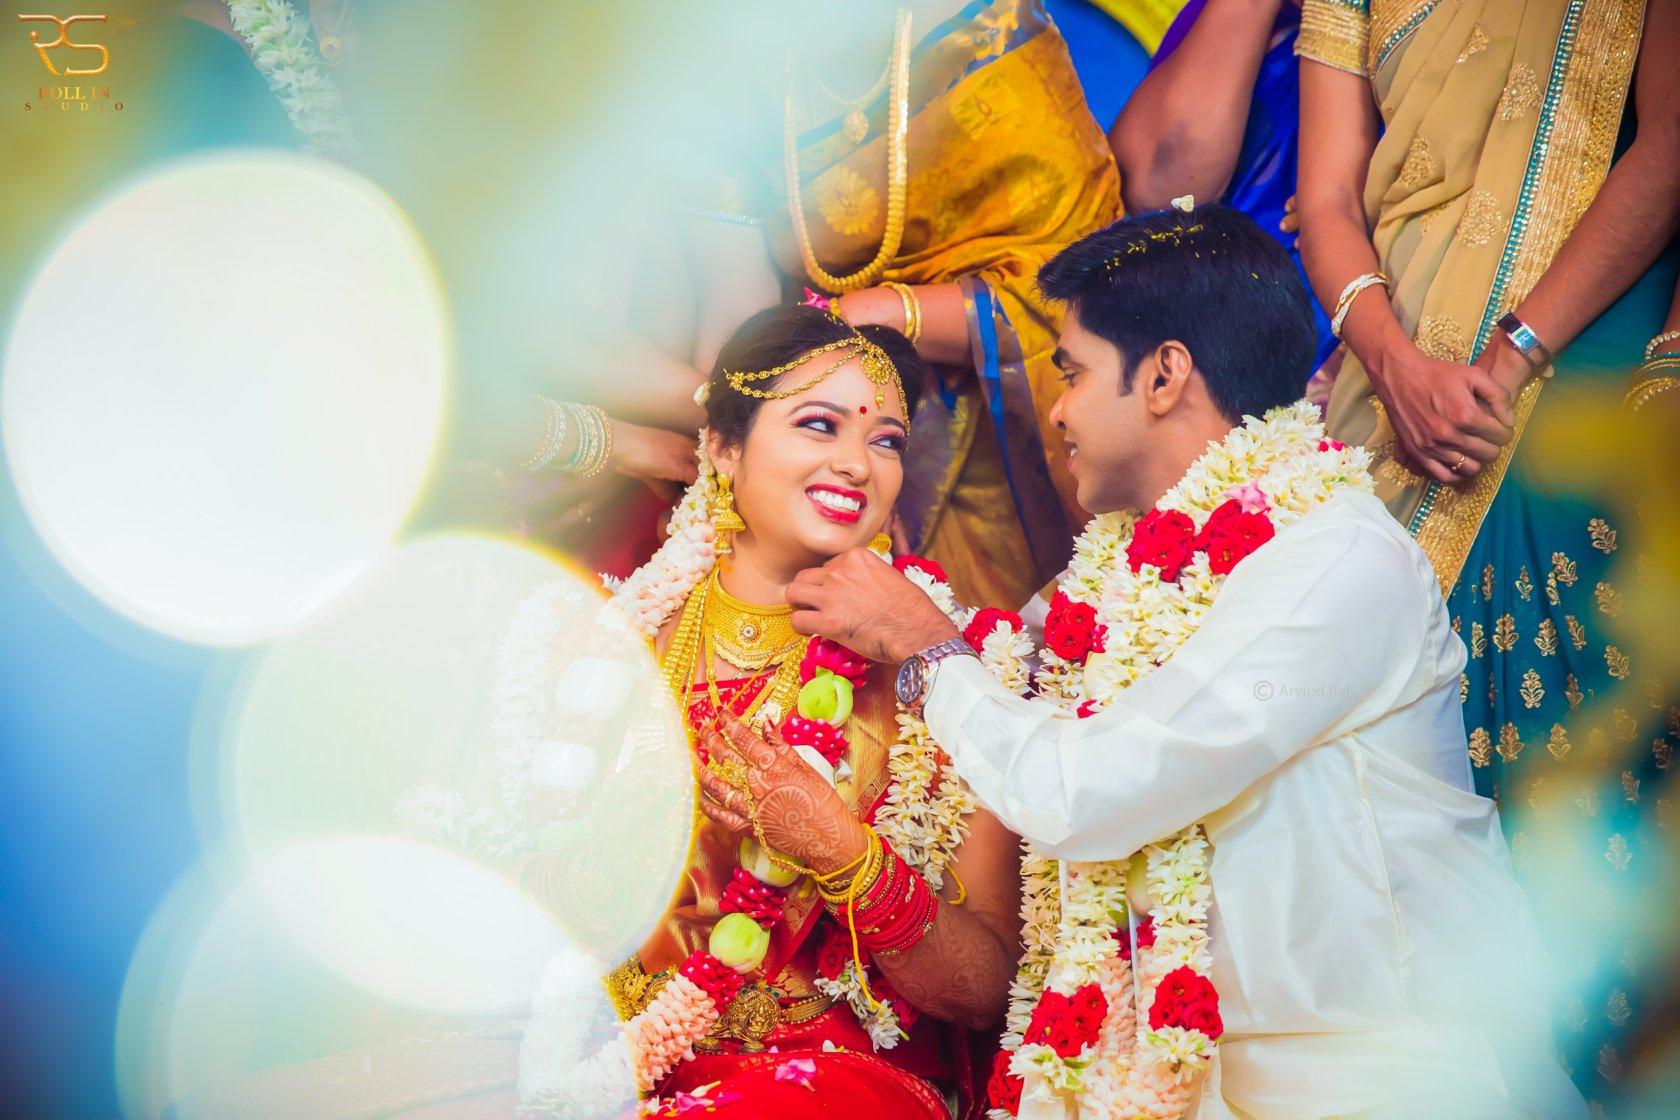 Beautiful feeling of the bride